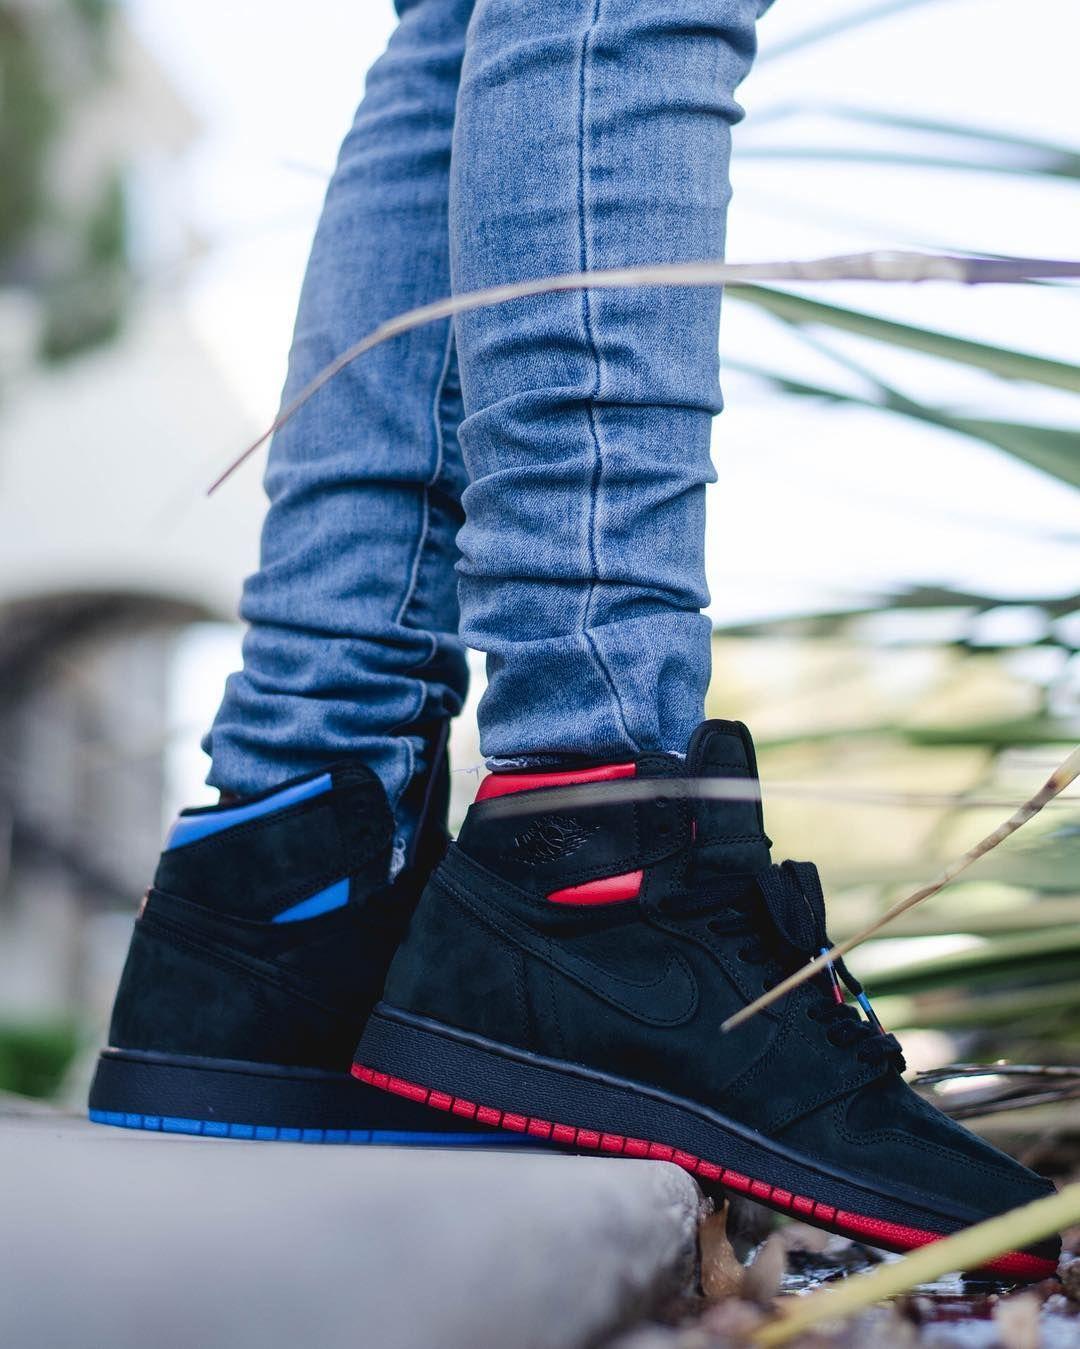 Air Jordan 1 Retro High Quai 54 \